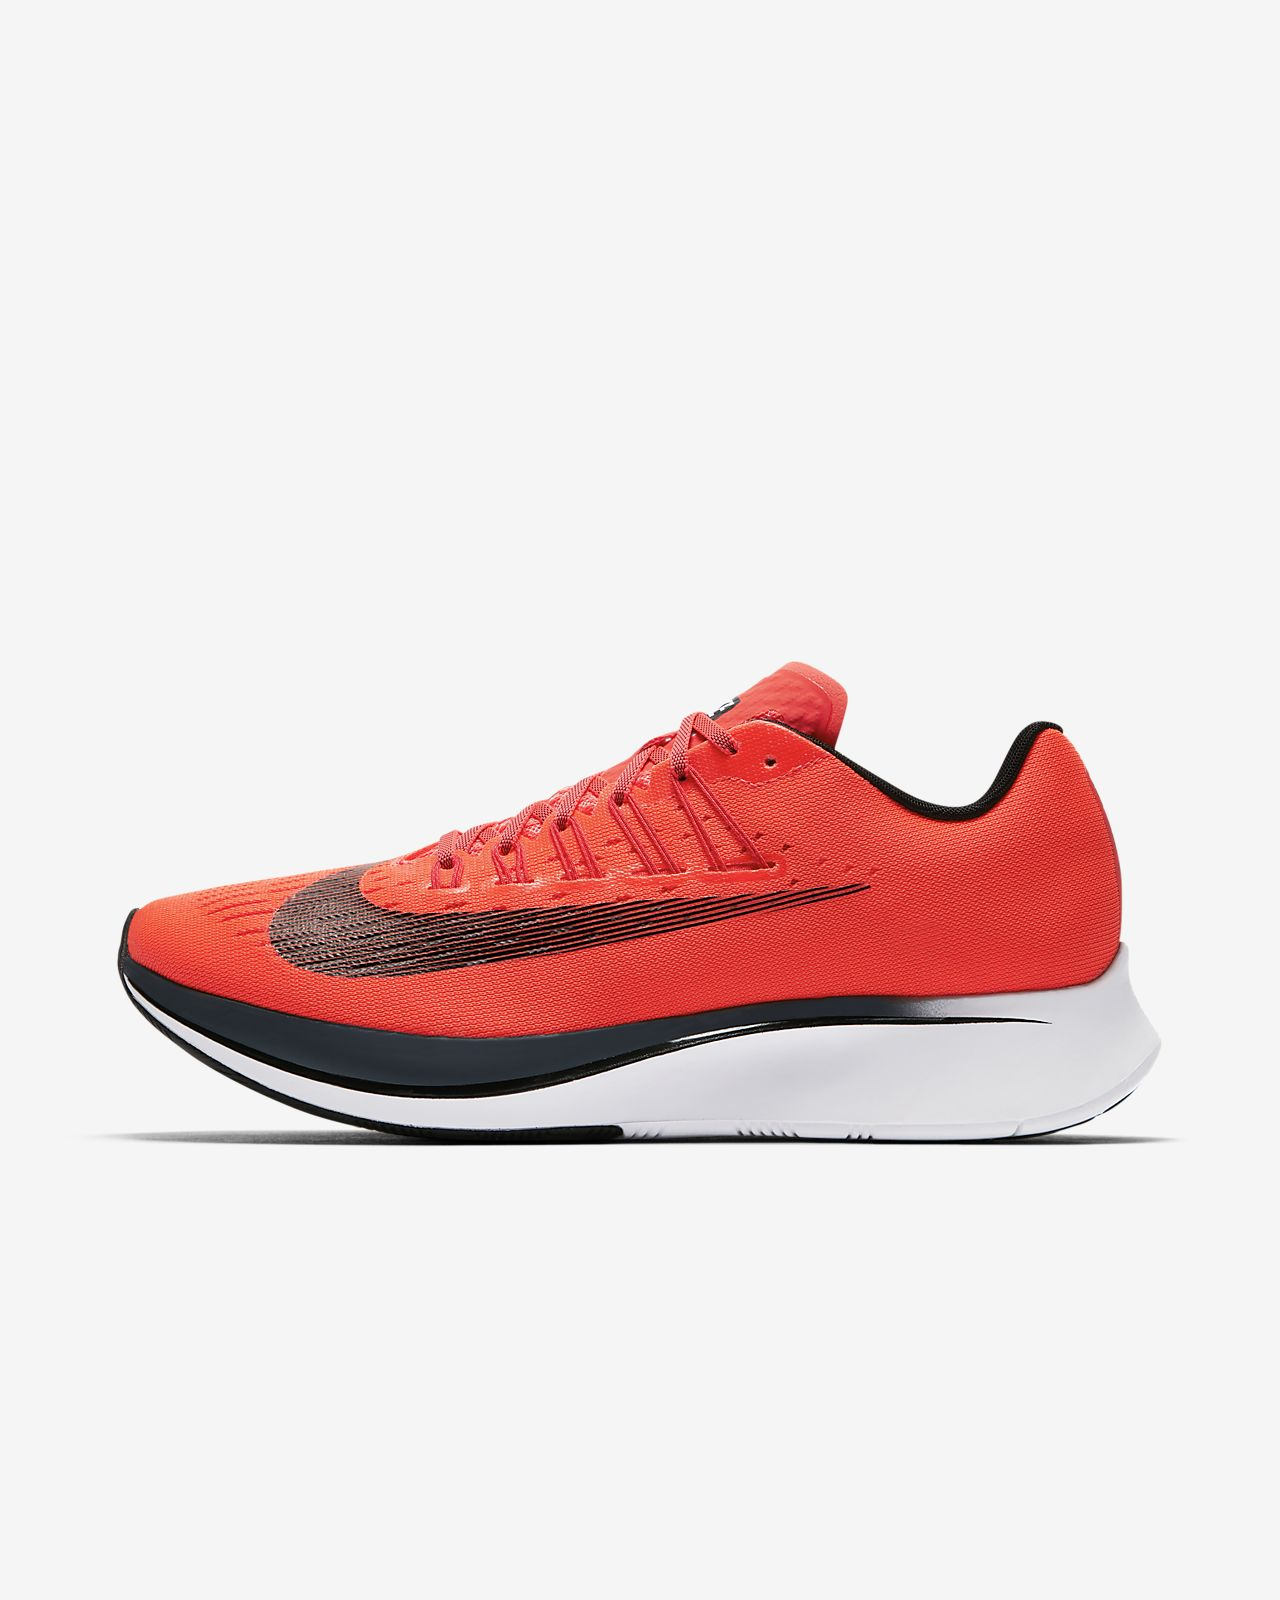 824c3f76 Мужские беговые кроссовки Nike Zoom Fly. Nike.com RU